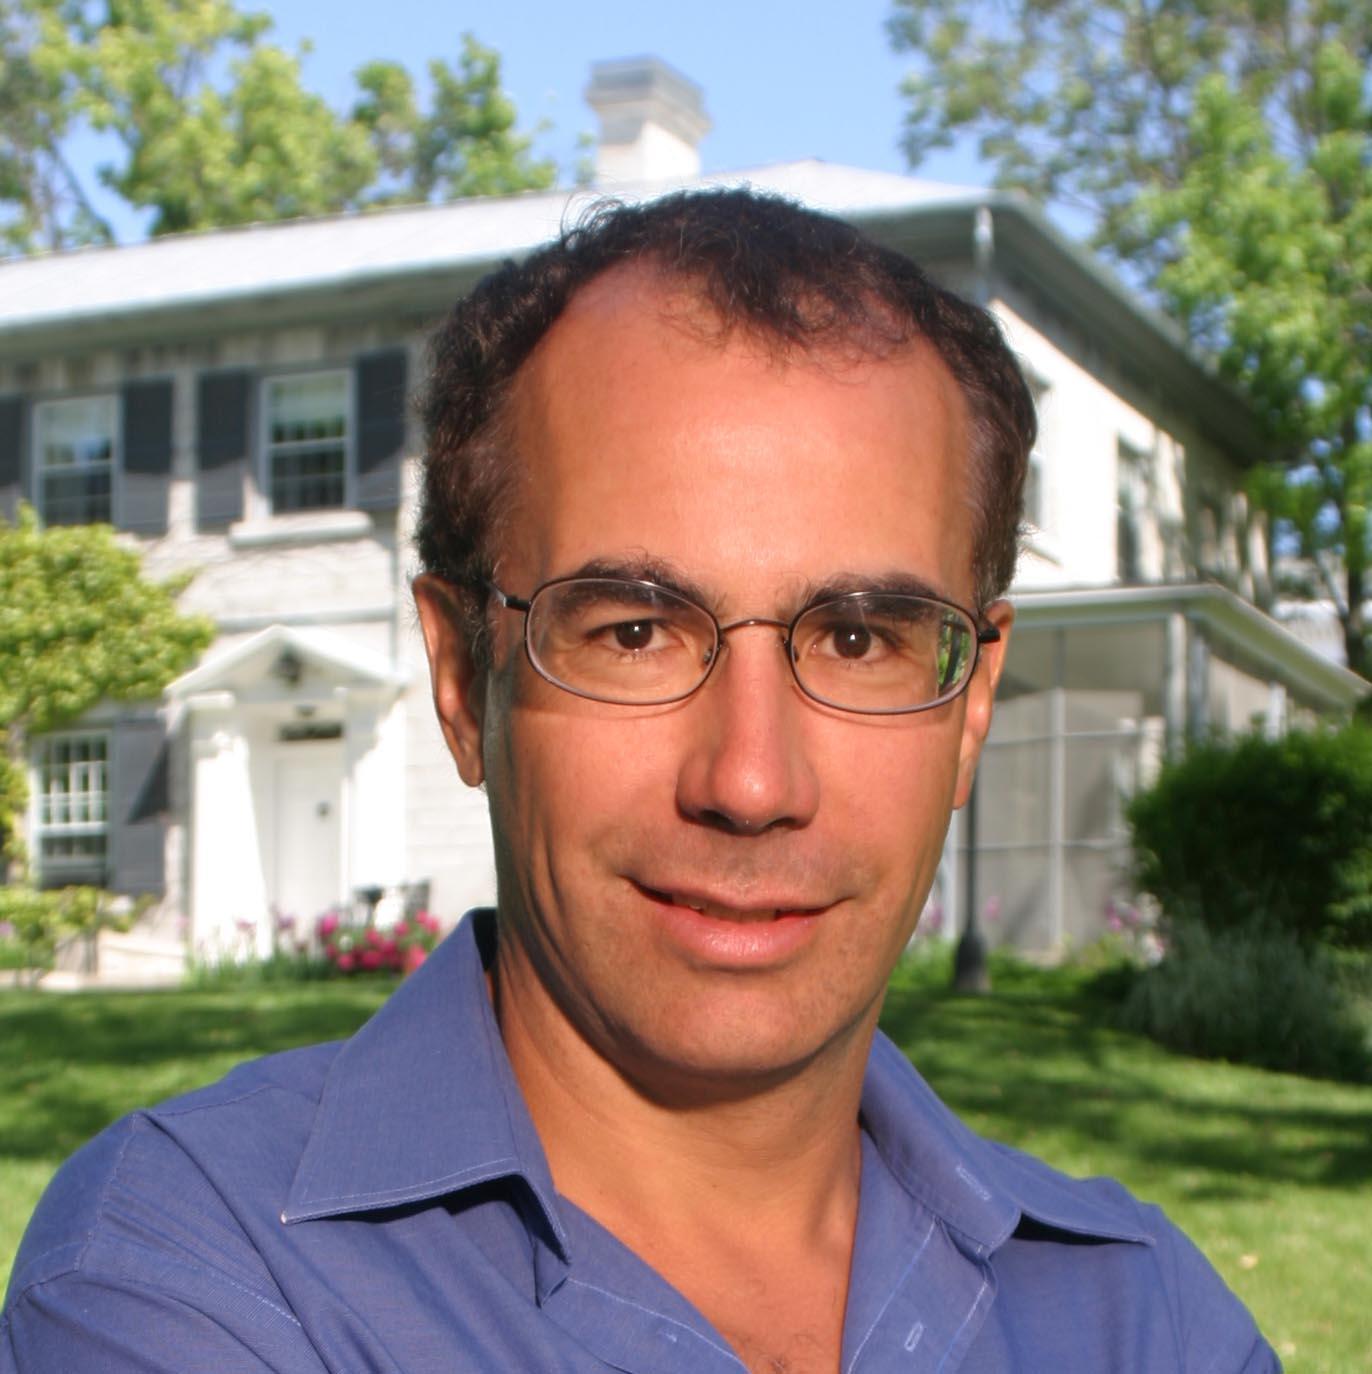 Douglas Munoz